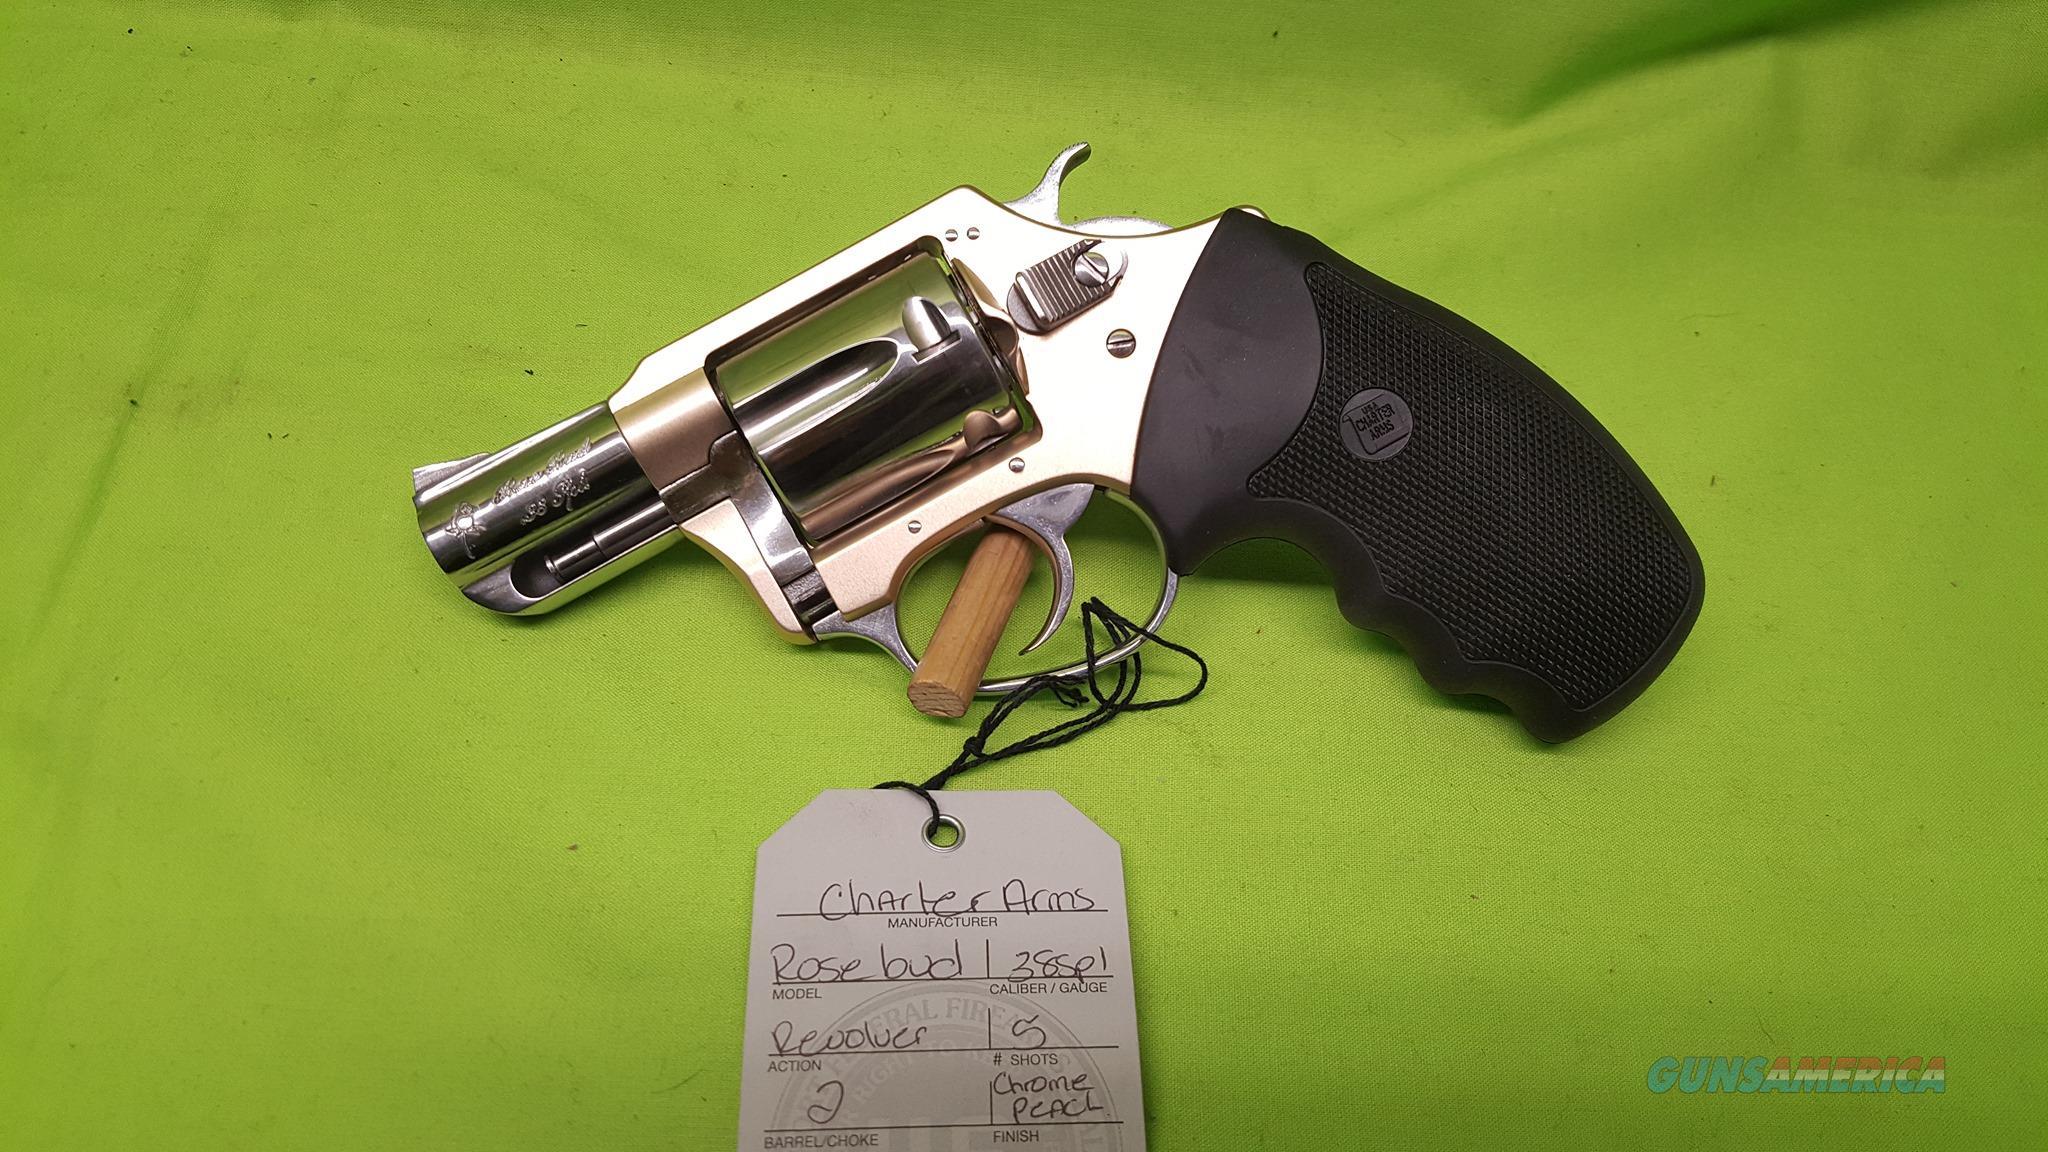 CHARTER ARMS UNDERCOVER ROSEBUD 38SPL 53859  Guns > Pistols > Charter Arms Revolvers